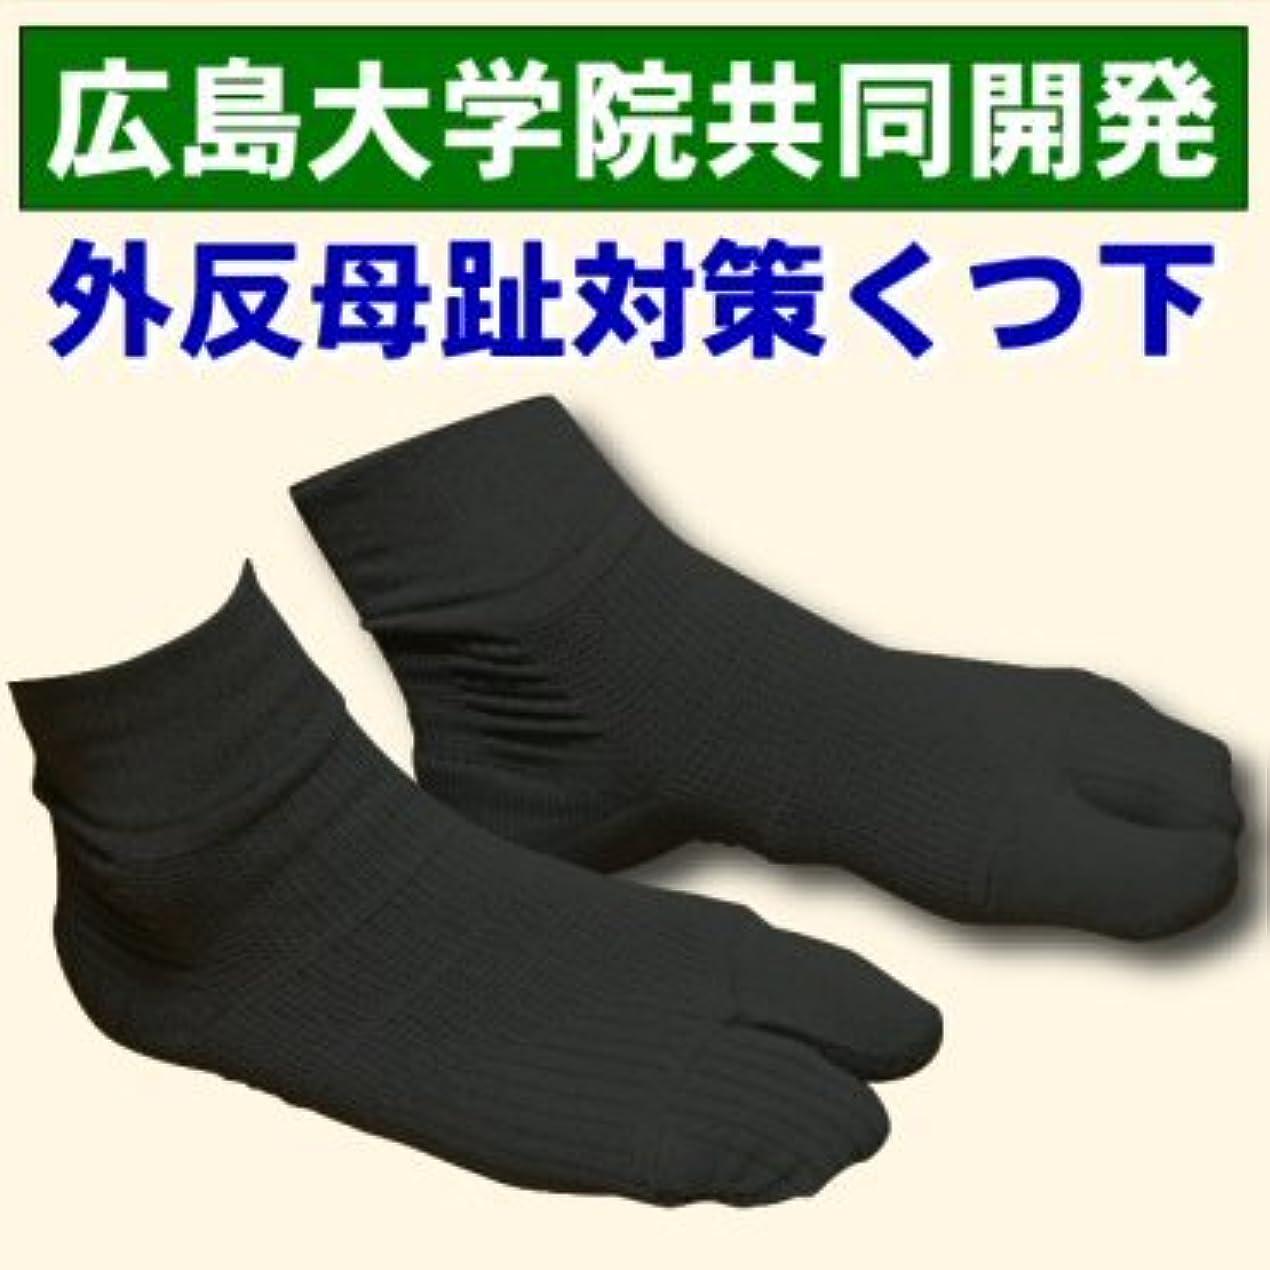 予想外乱気流二層外反母趾対策靴下(24-25cm?ブラック)【日本製】